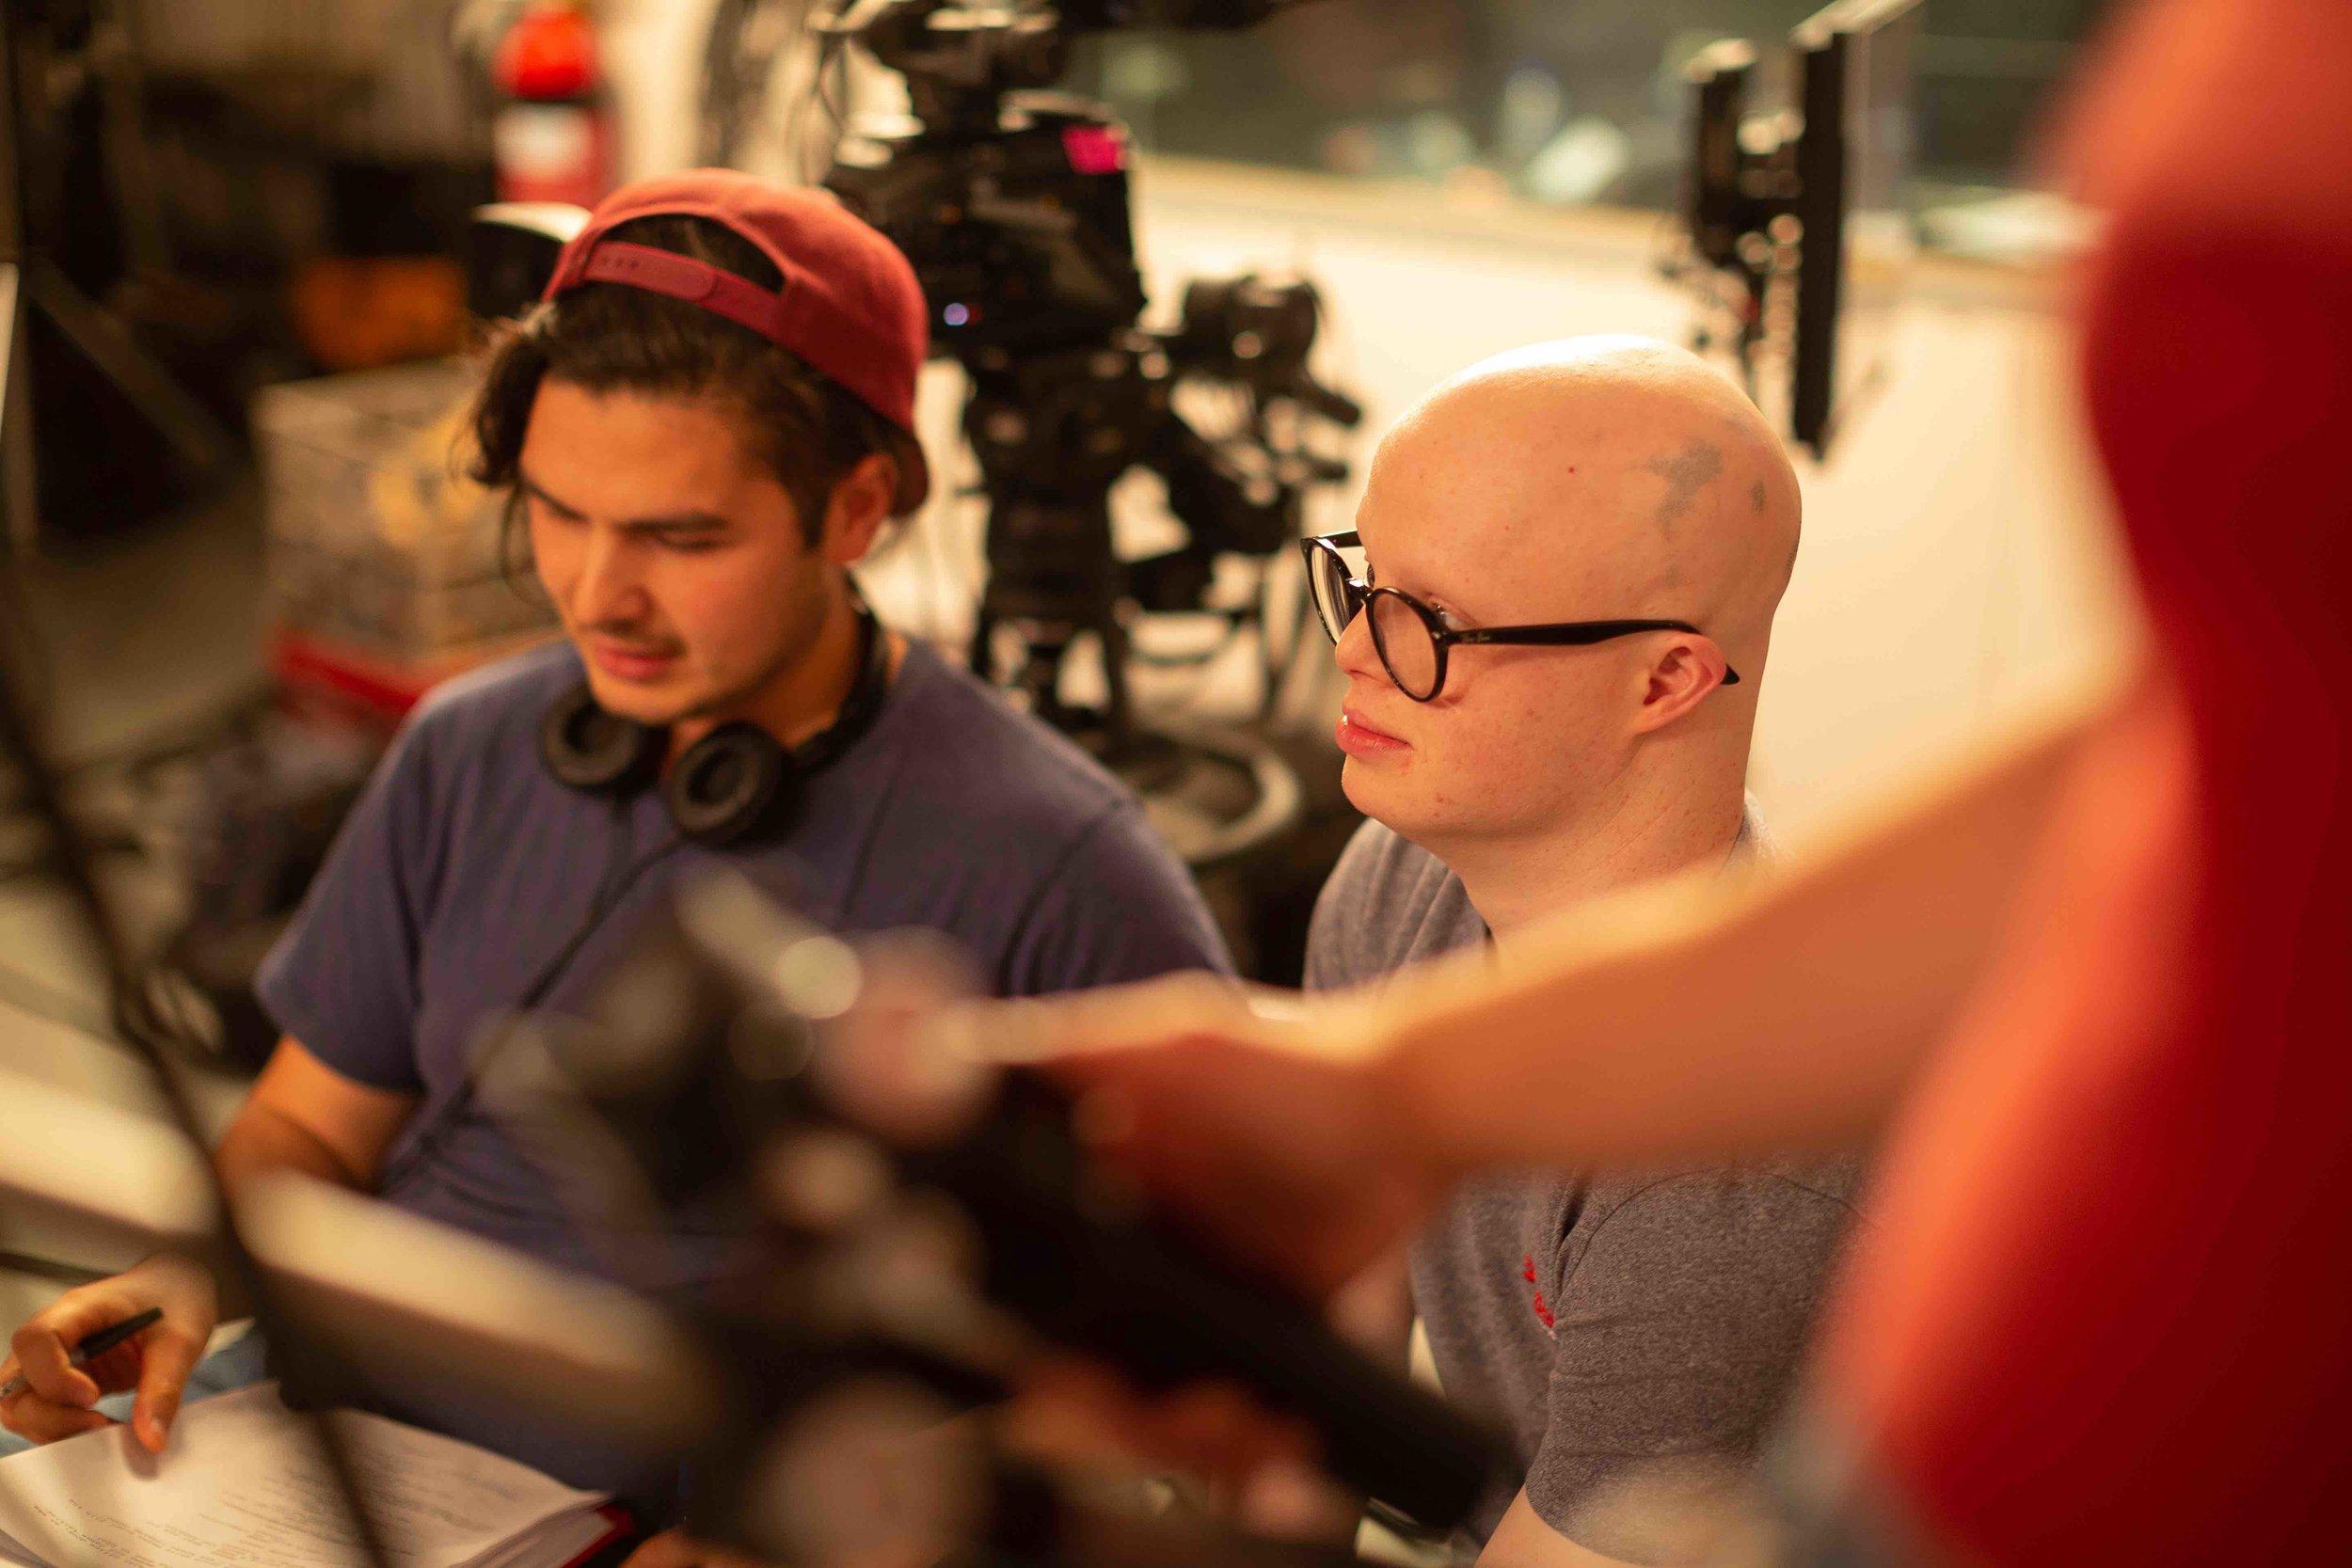 Johanis_and_Lorcan_on_set_The Loop_©2019_Change_Media_photo_Piri_Eddy.jpg